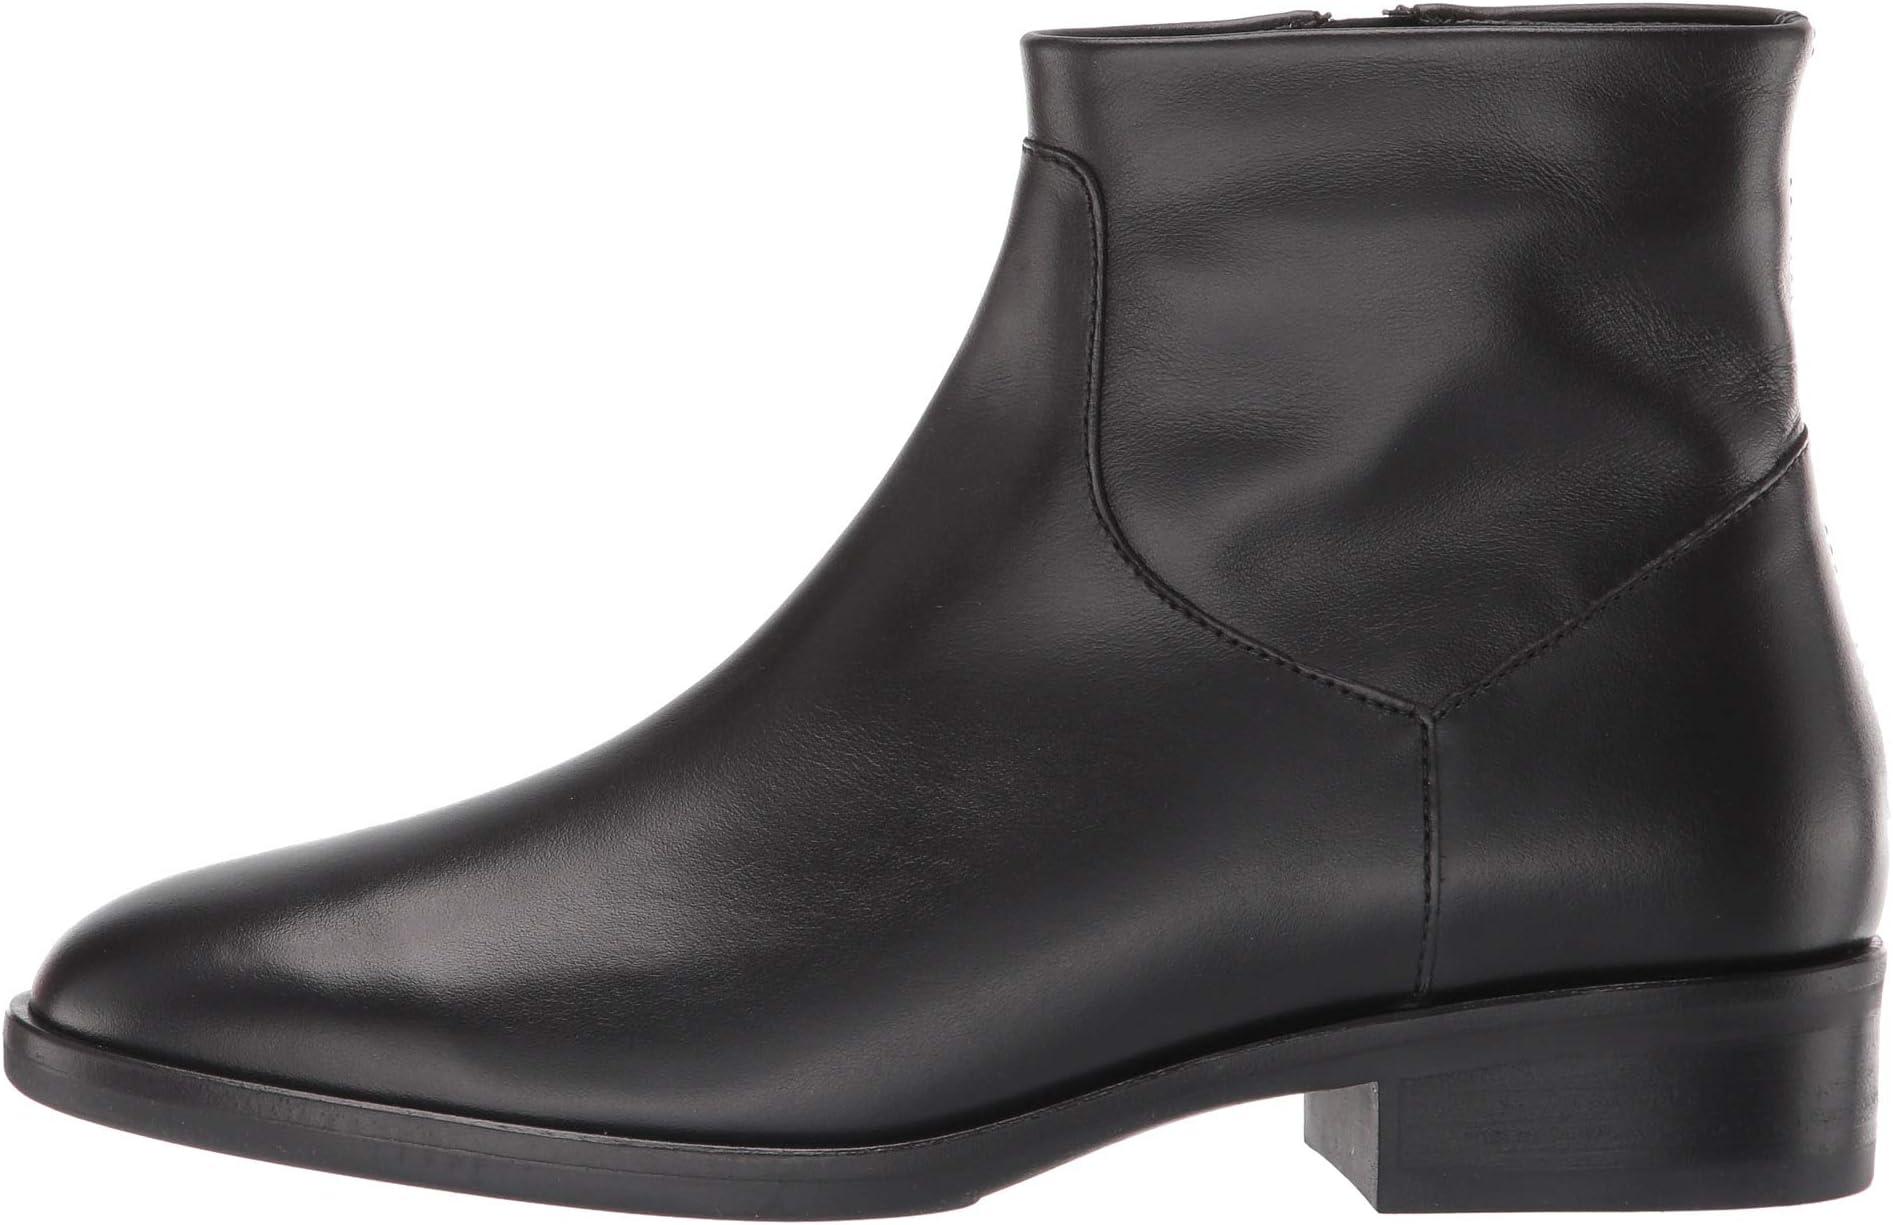 Clarks Pure Rosa | Women's shoes | 2020 Newest